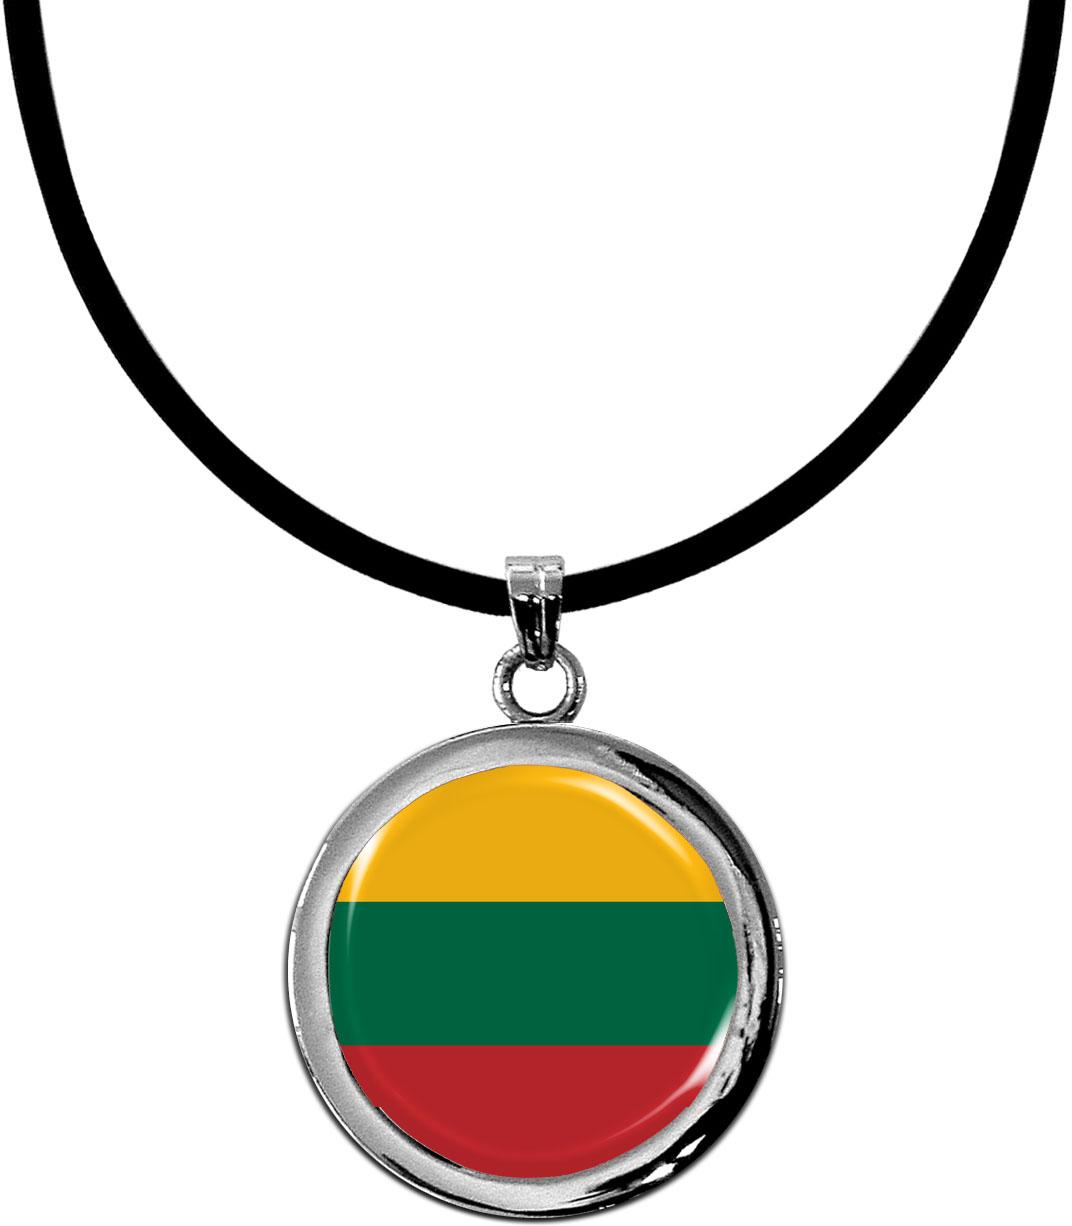 Kettenanhänger / Litauen / Silikonband mit Silberverschluss